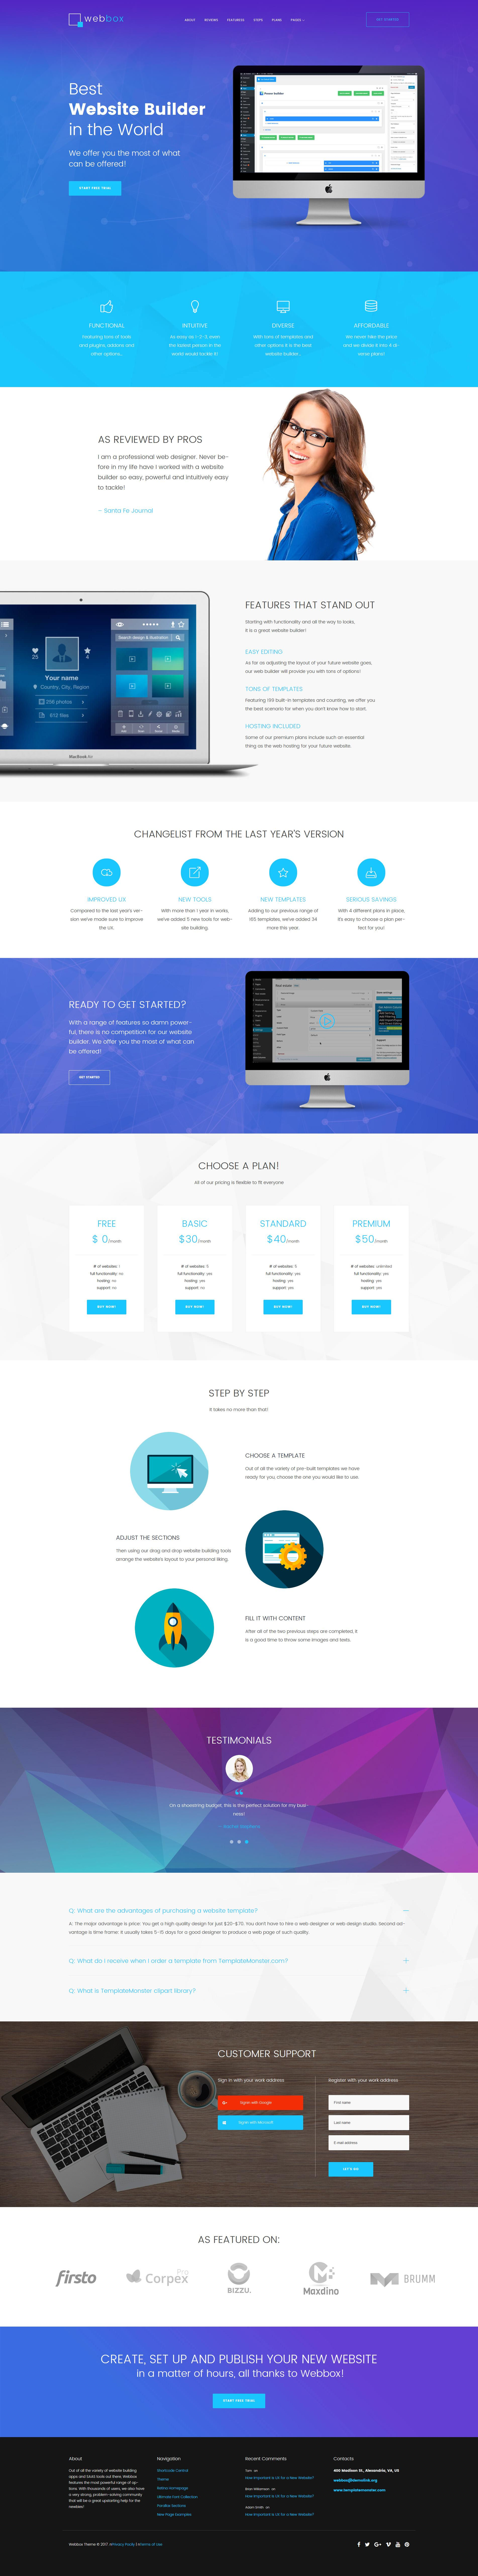 Responsywny motyw WordPress Webbox - One Page Product Landing #63548